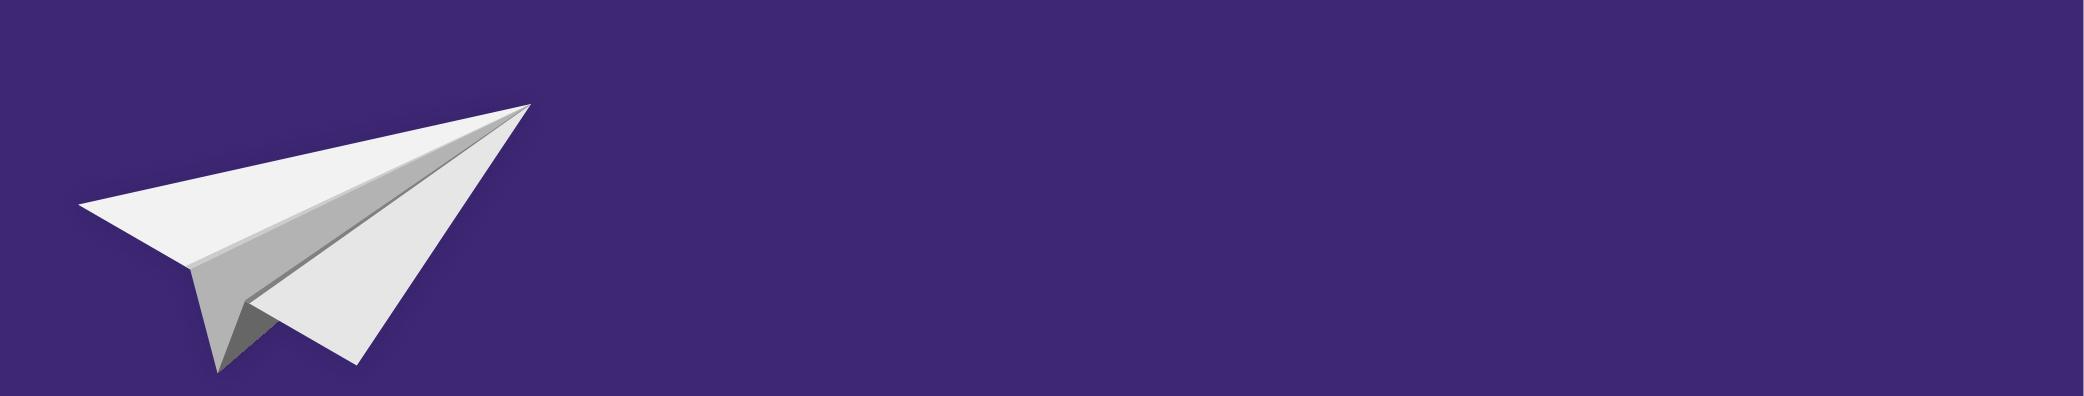 Newsletter-icon-violet-01